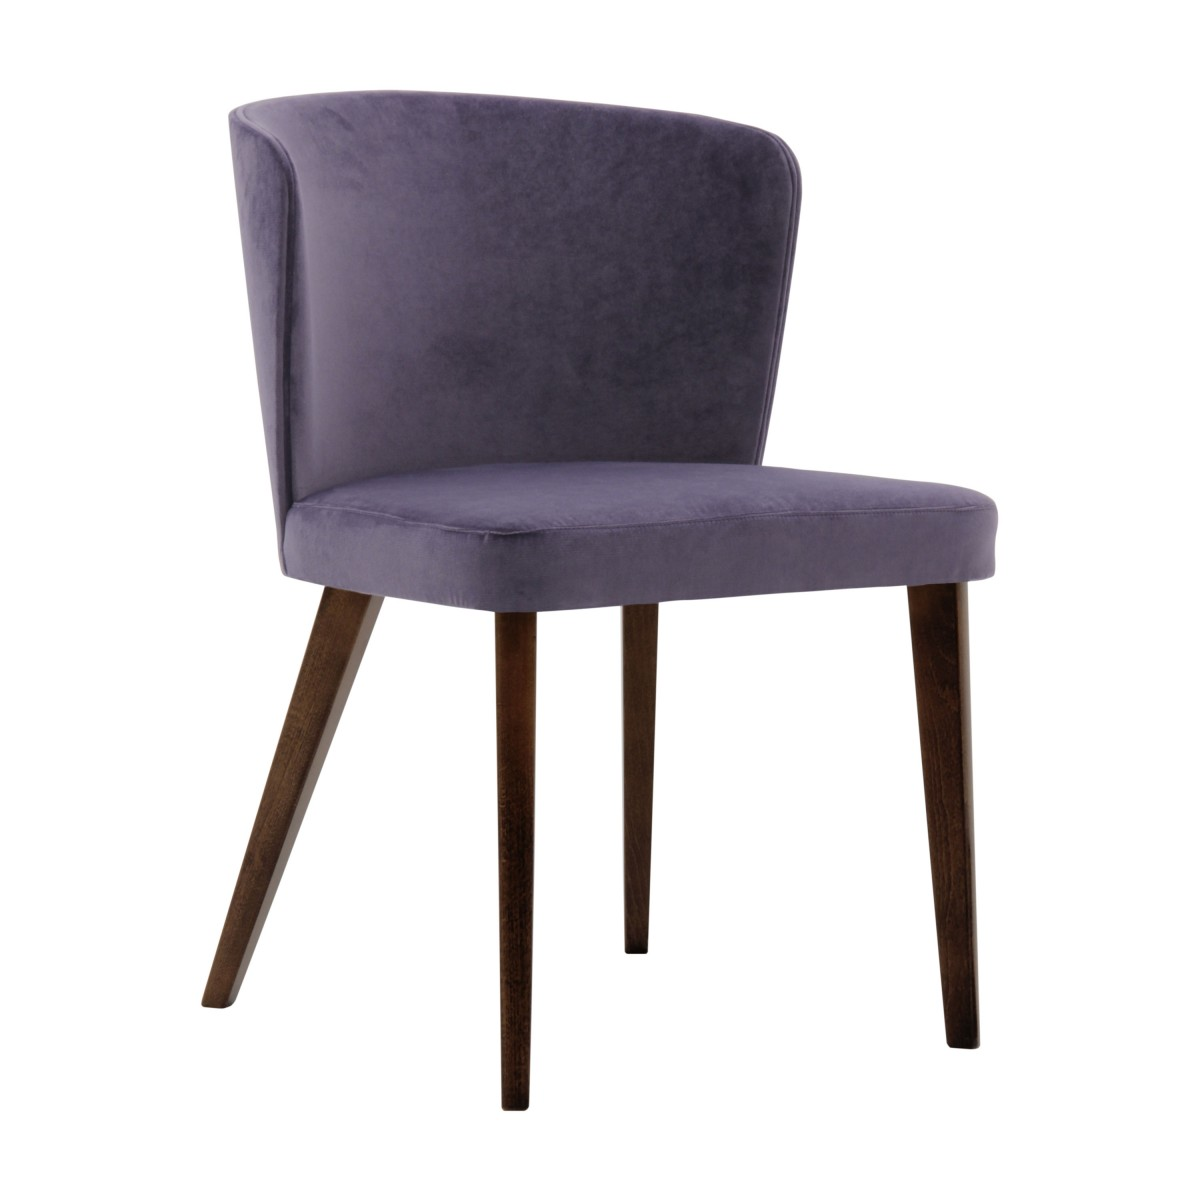 italian modern chair eva 2512